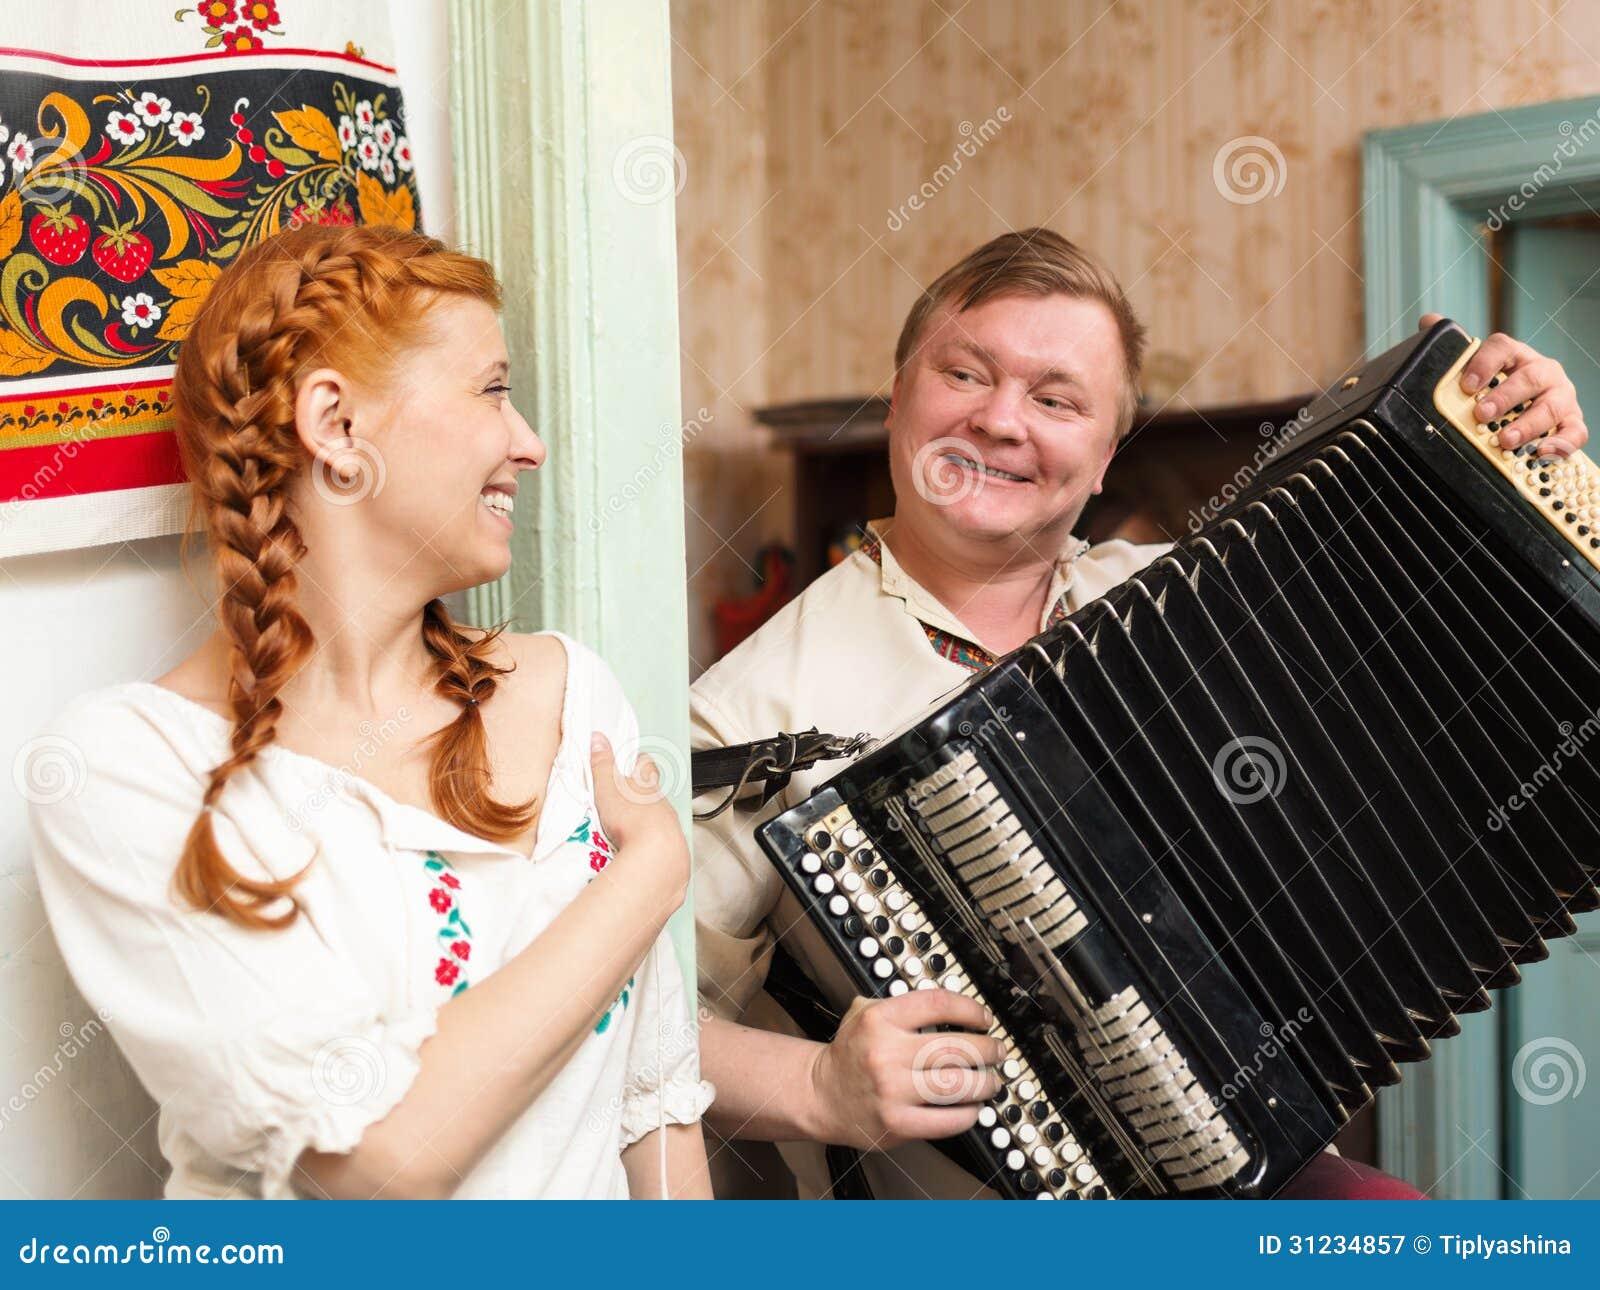 Будни русской пары — photo 4